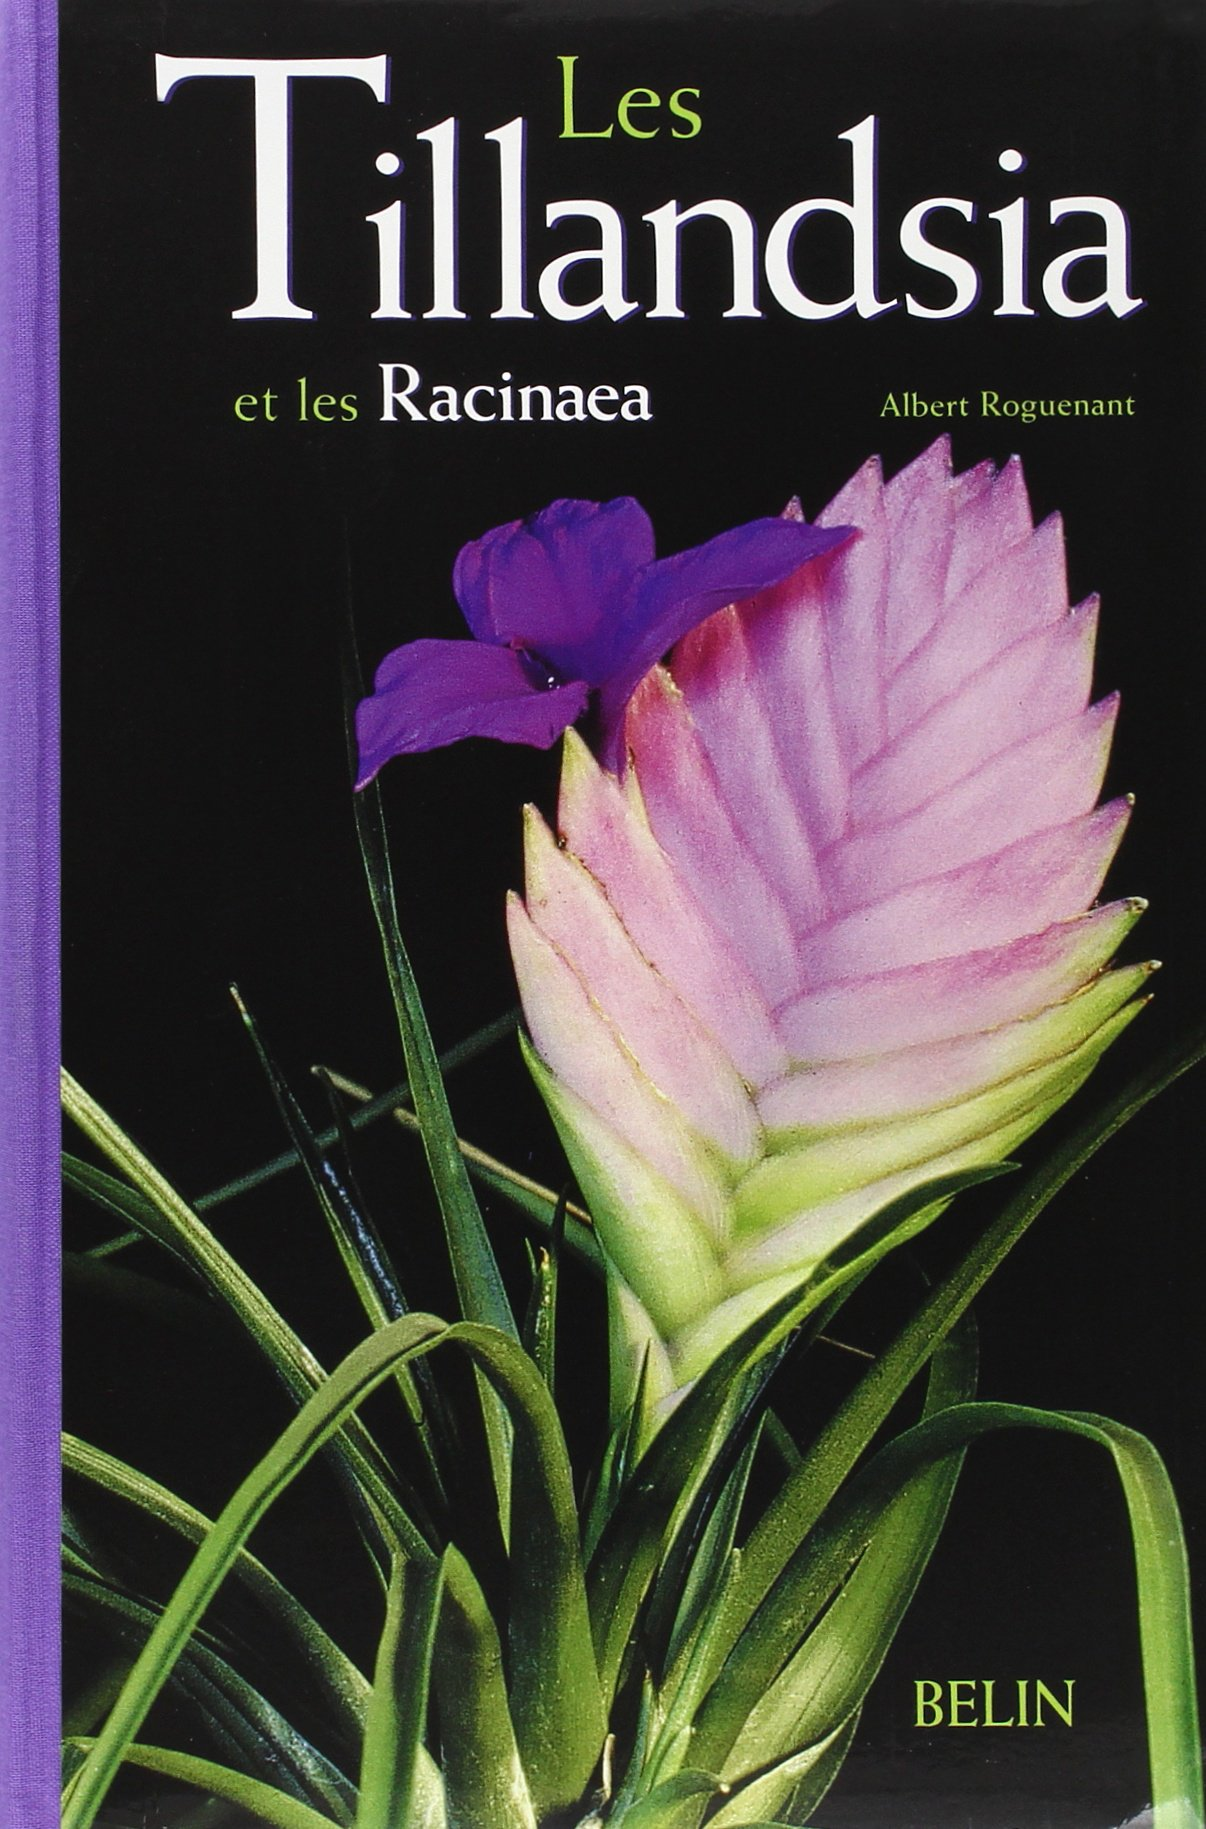 Les Tillandsia et les Racinaea (Botanique)